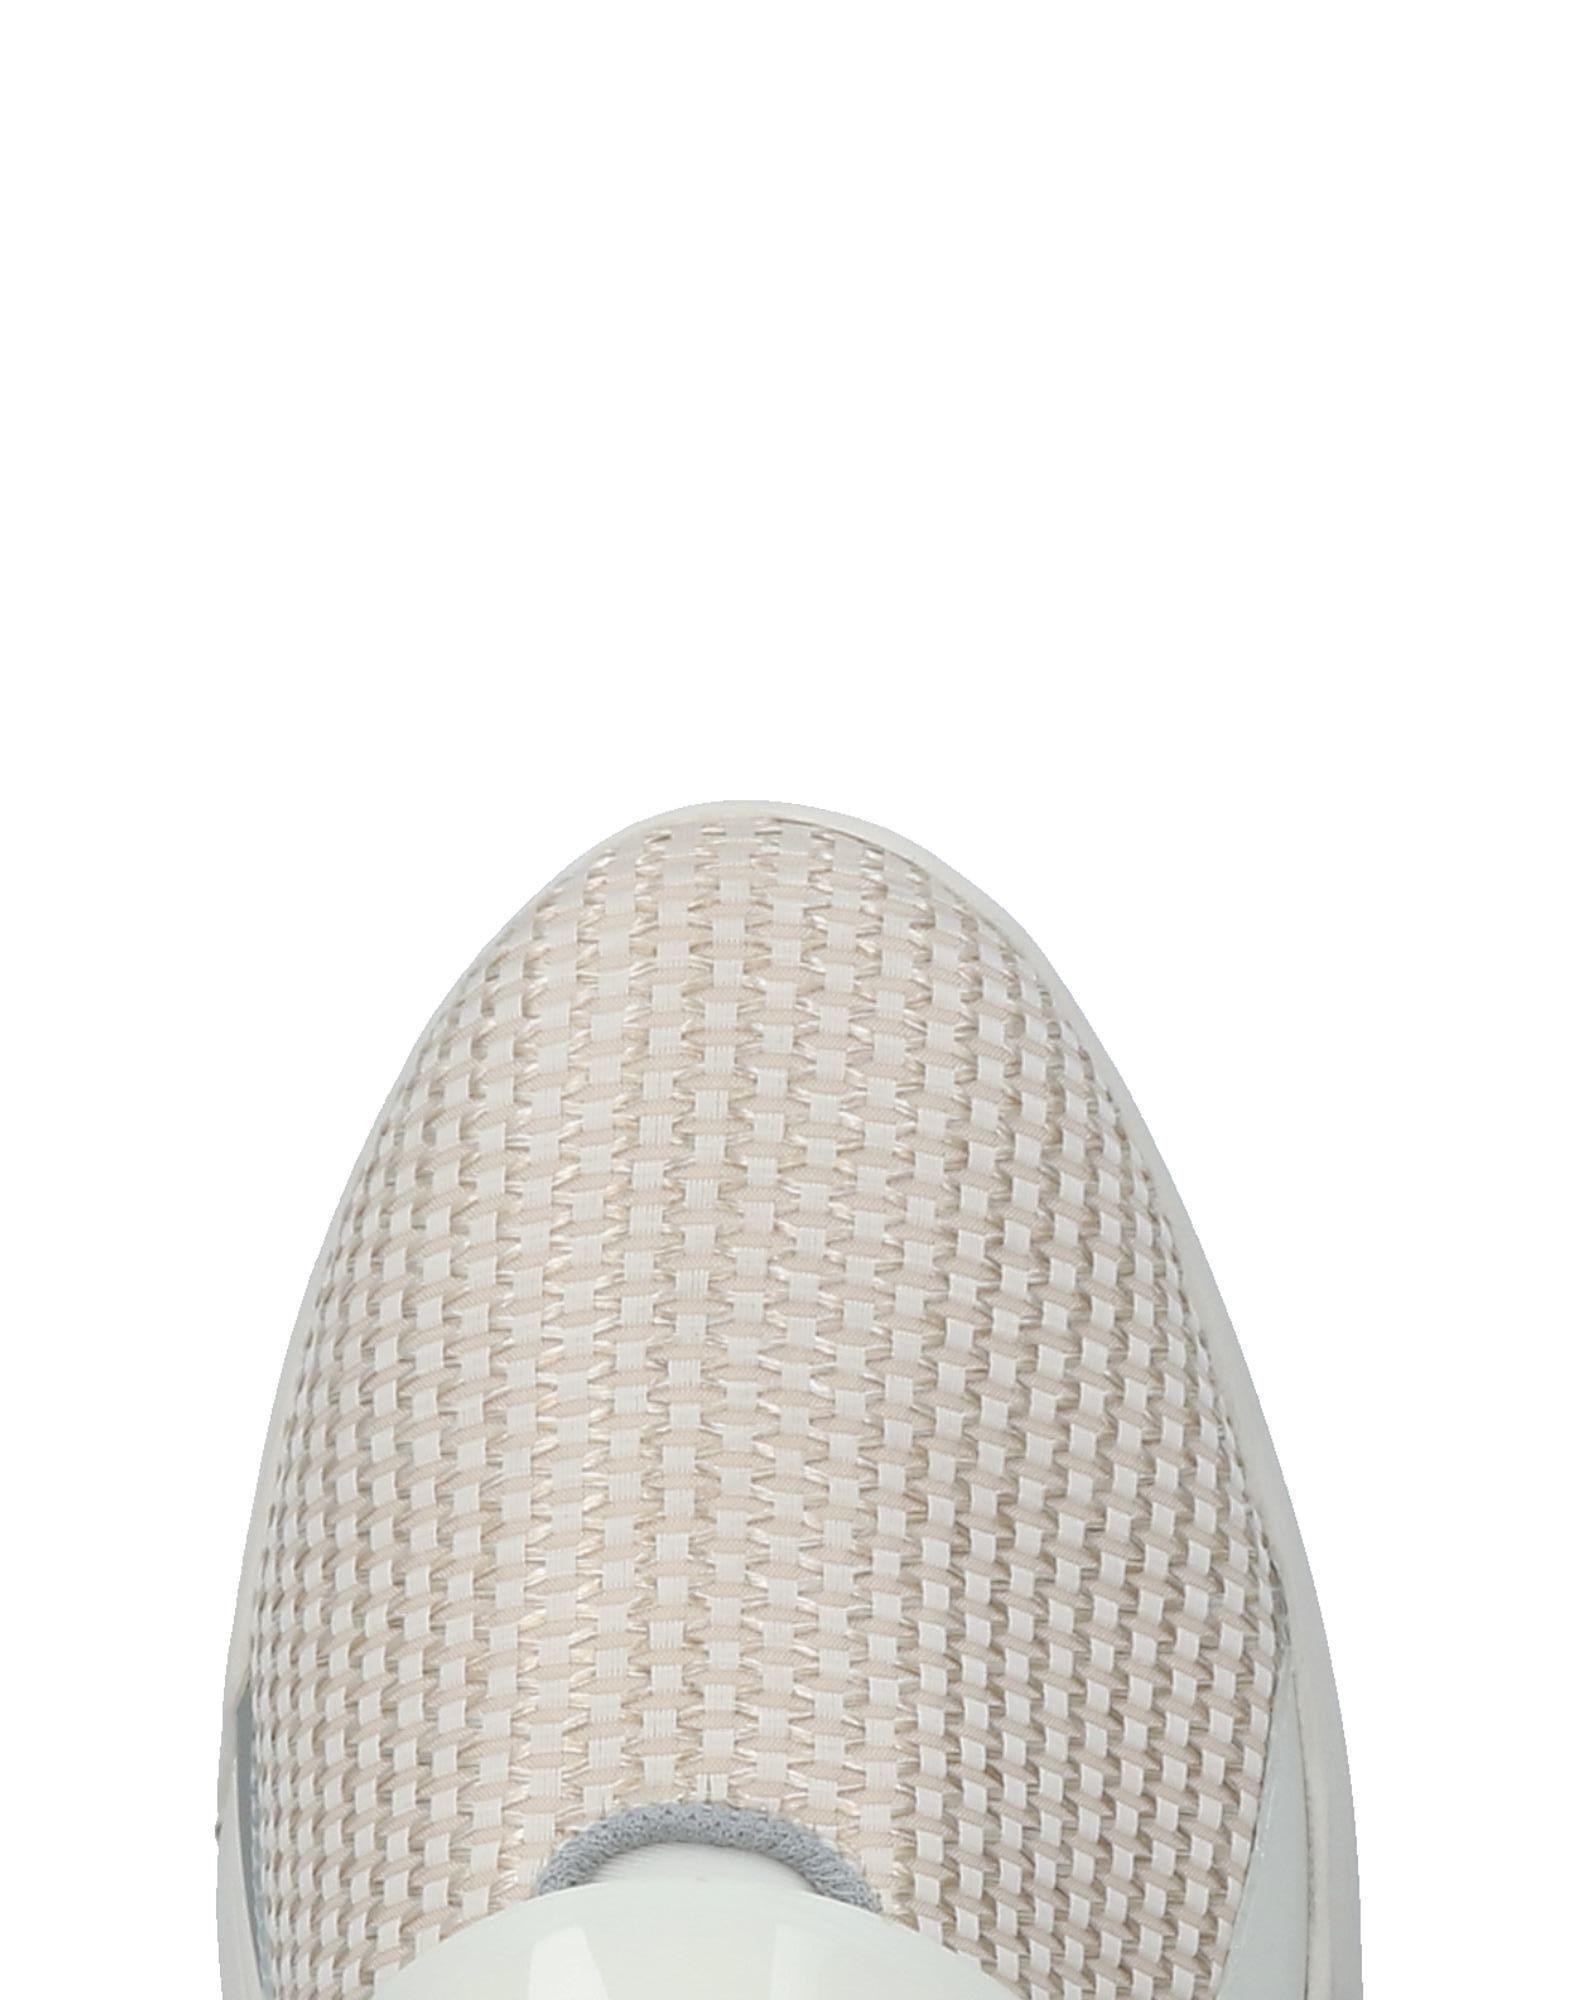 Soisire Soiebleu Rubber Low-tops & Sneakers in Beige (Natural)